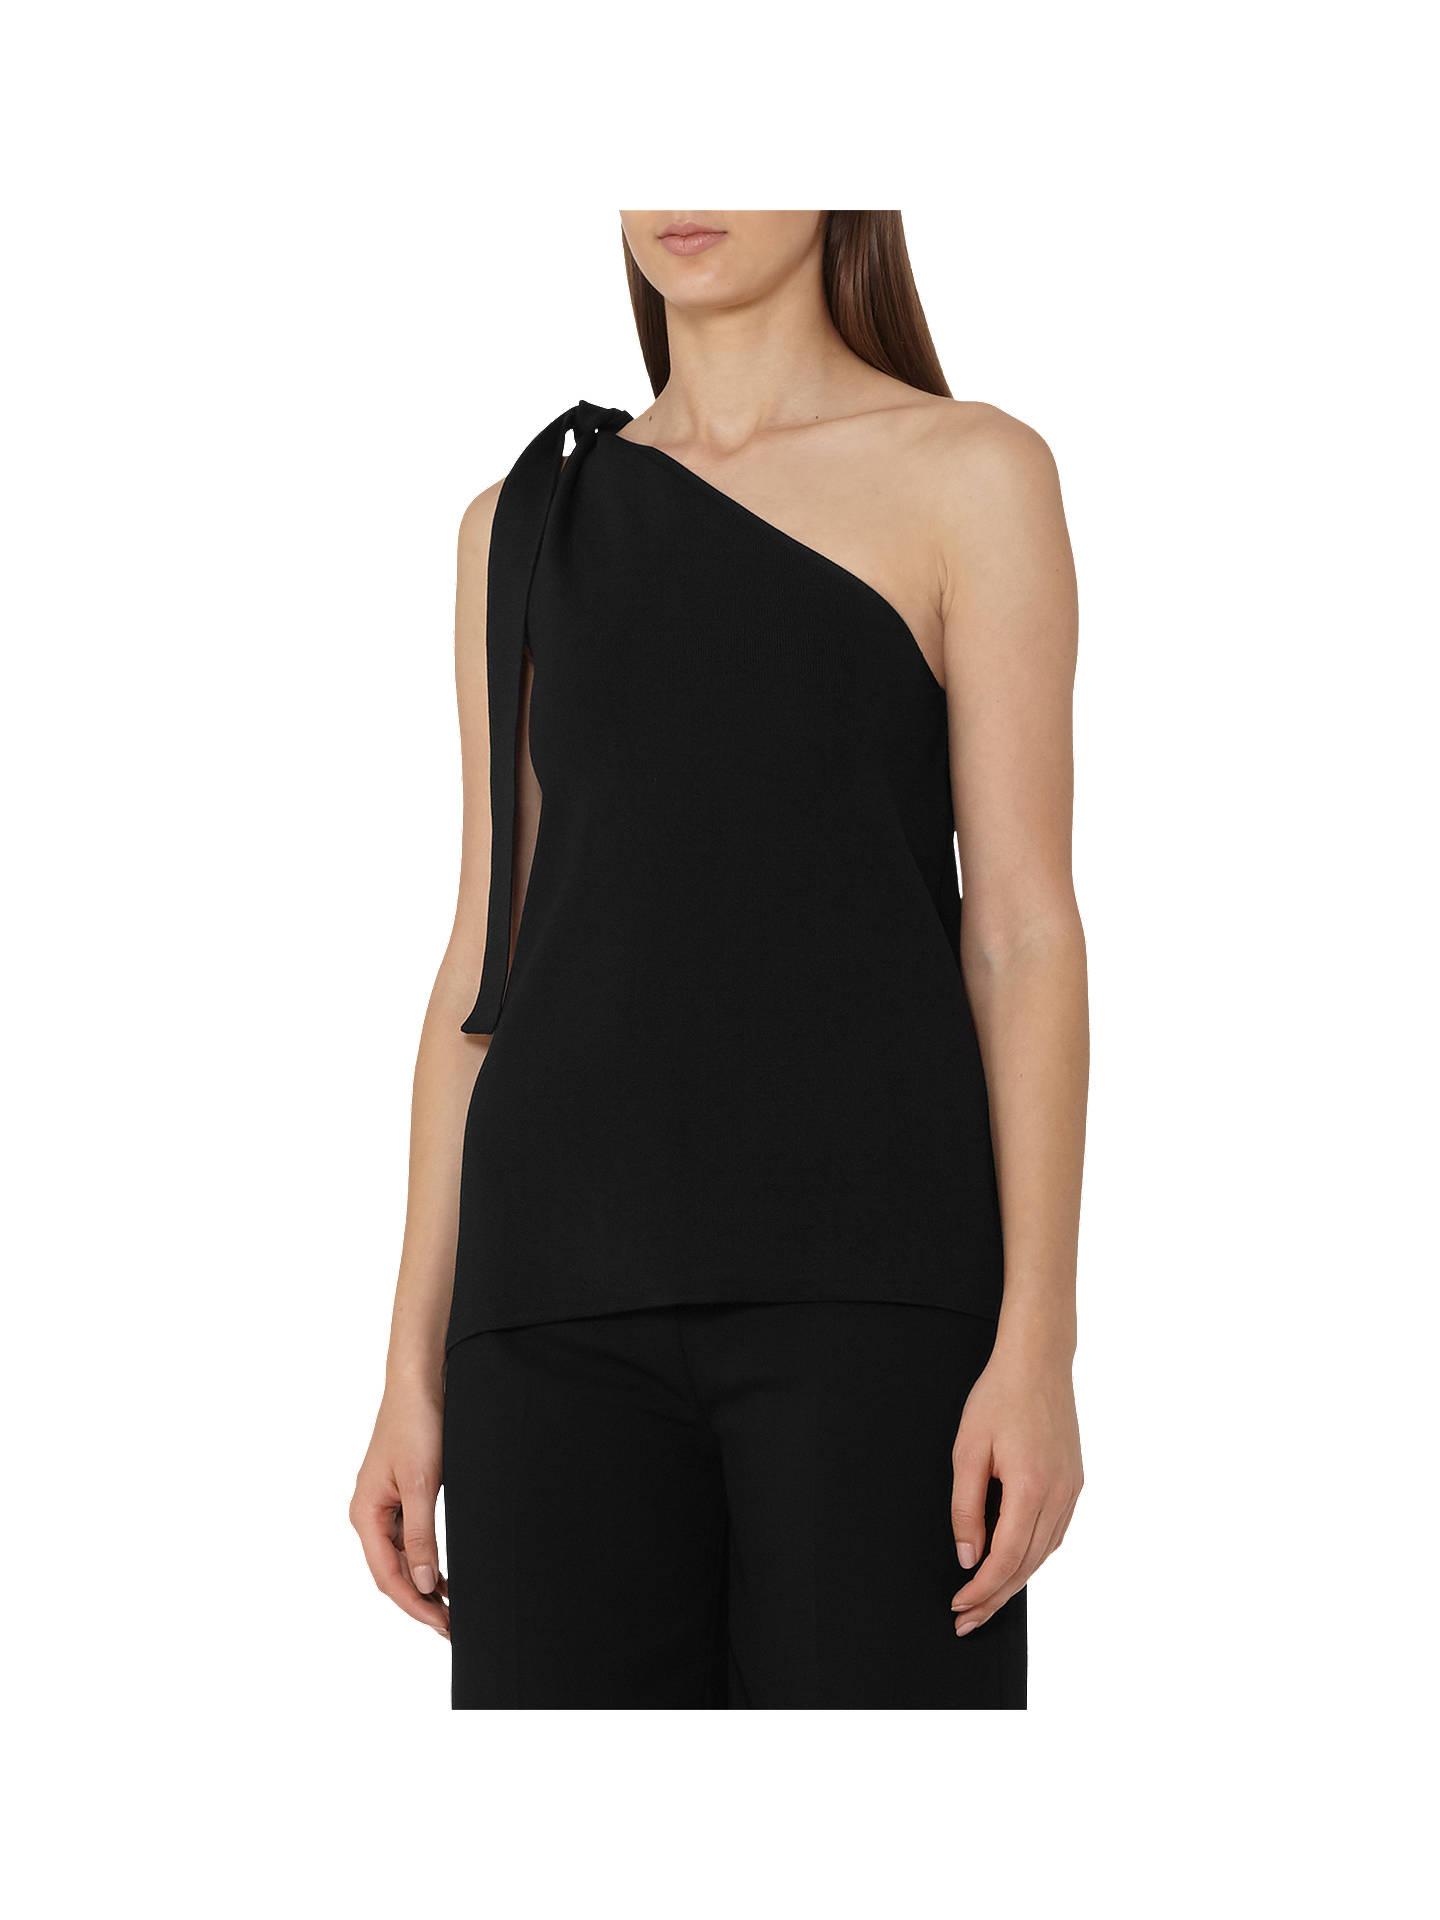 08c5371a5d511 Reiss Henrietta One-Shoulder Knitted Top at John Lewis   Partners